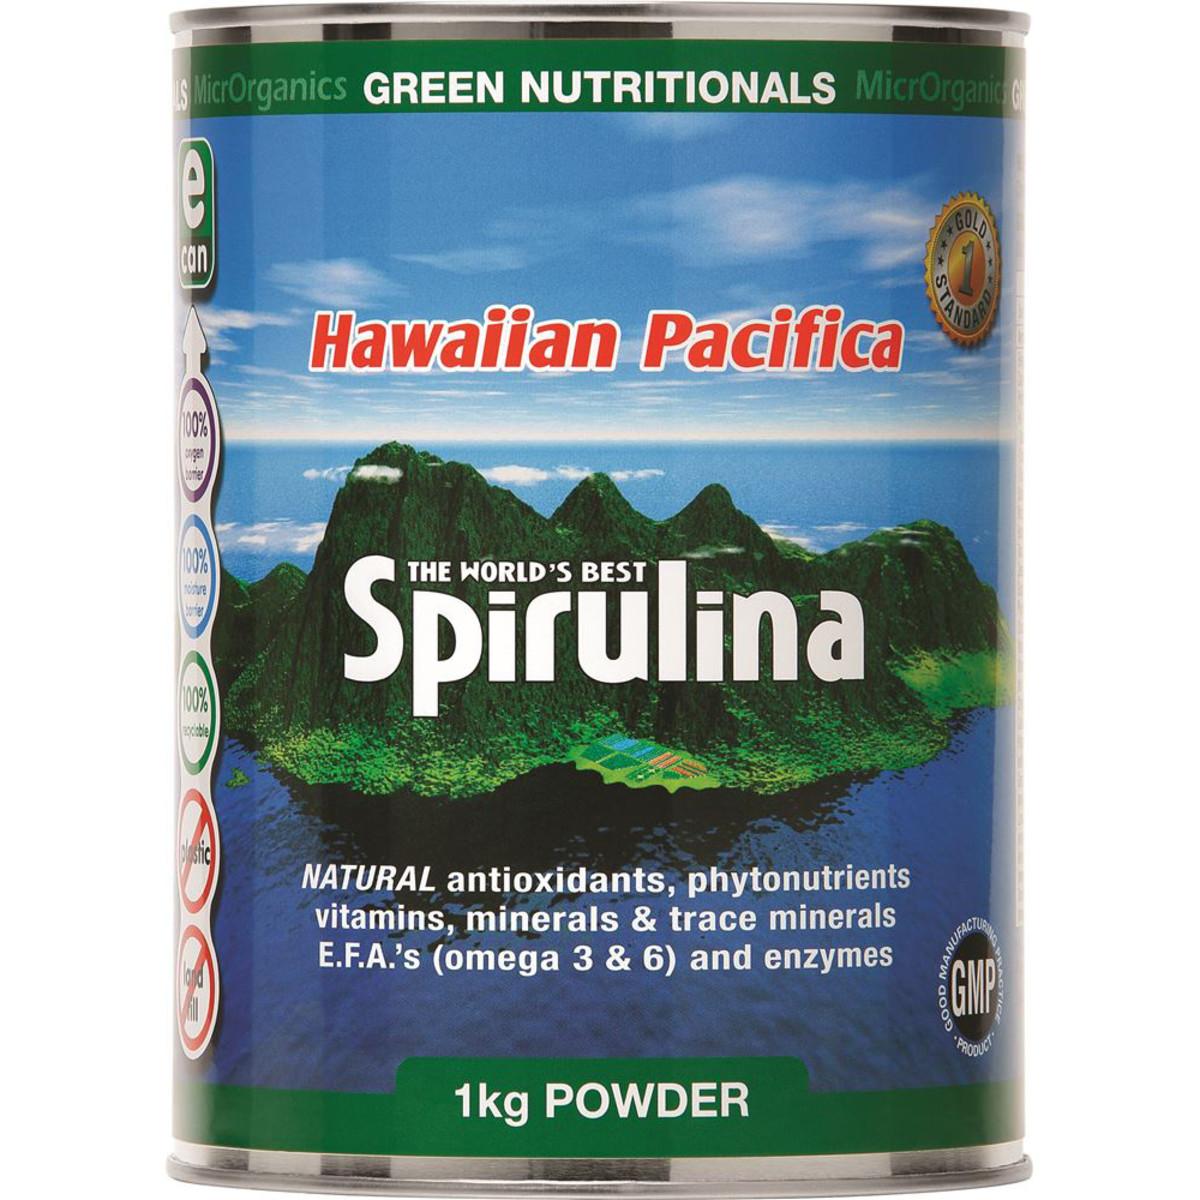 Spirulina Powder - Hawaiian Pacifica Spirulina 1kg